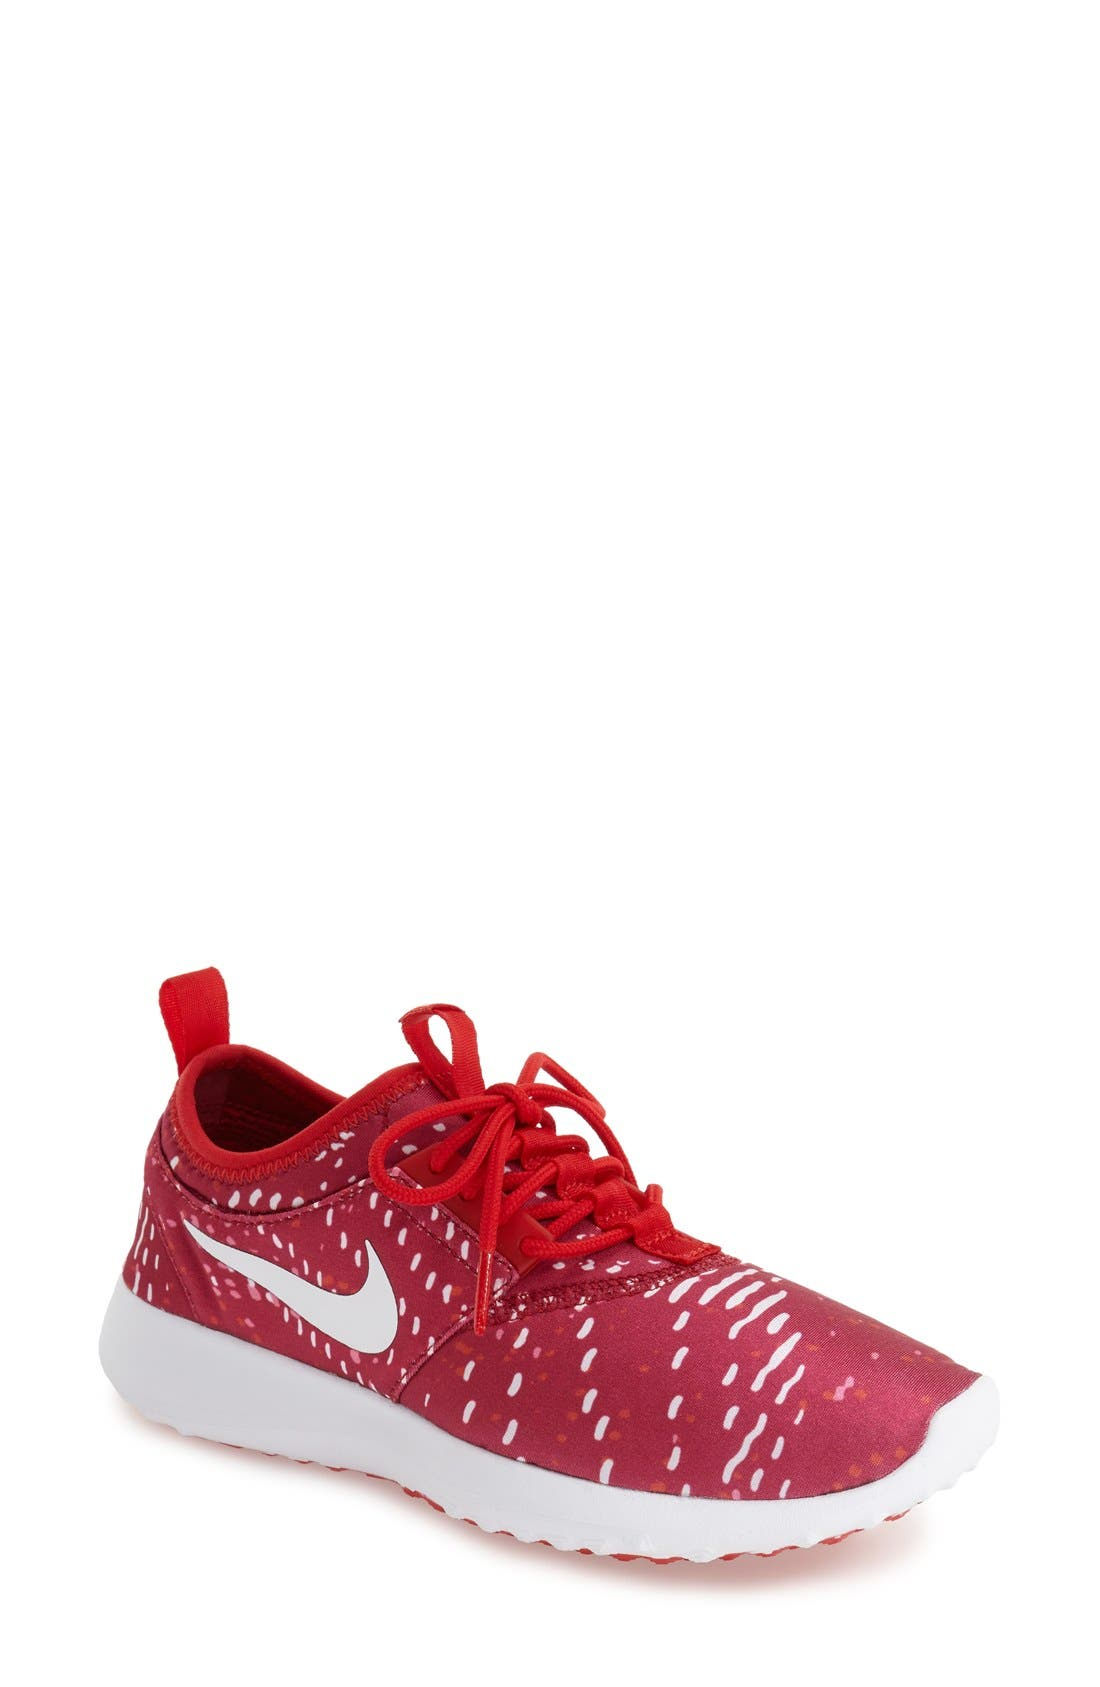 Main Image - Nike 'Juvenate' Print Sneaker (Women)